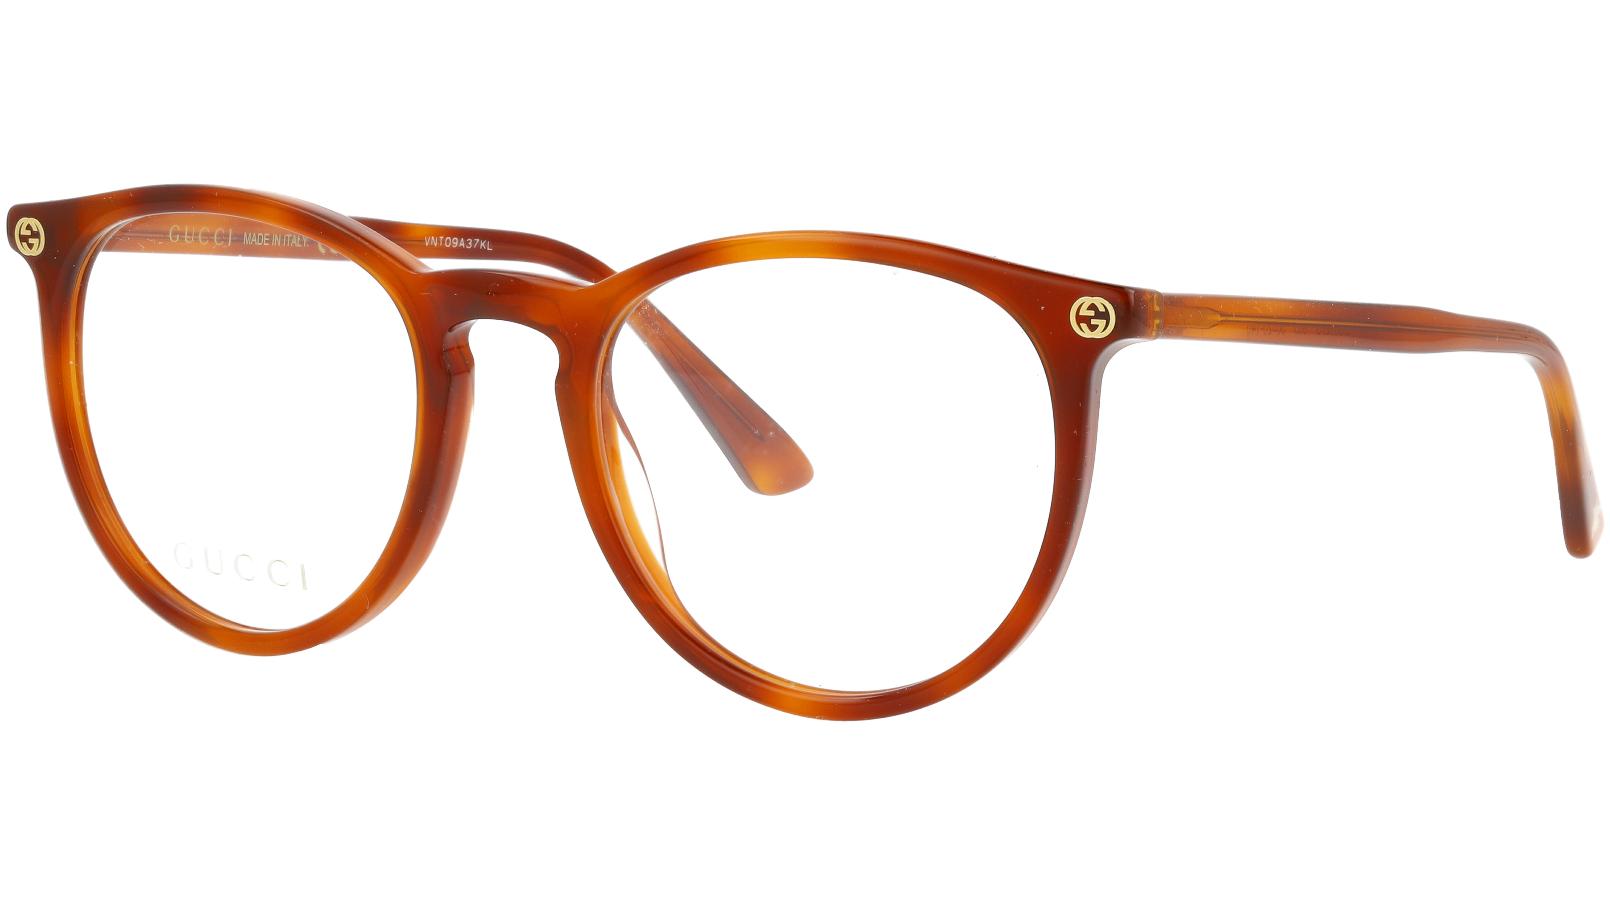 GUCCI GG0027O 003 50 AVANA Glasses